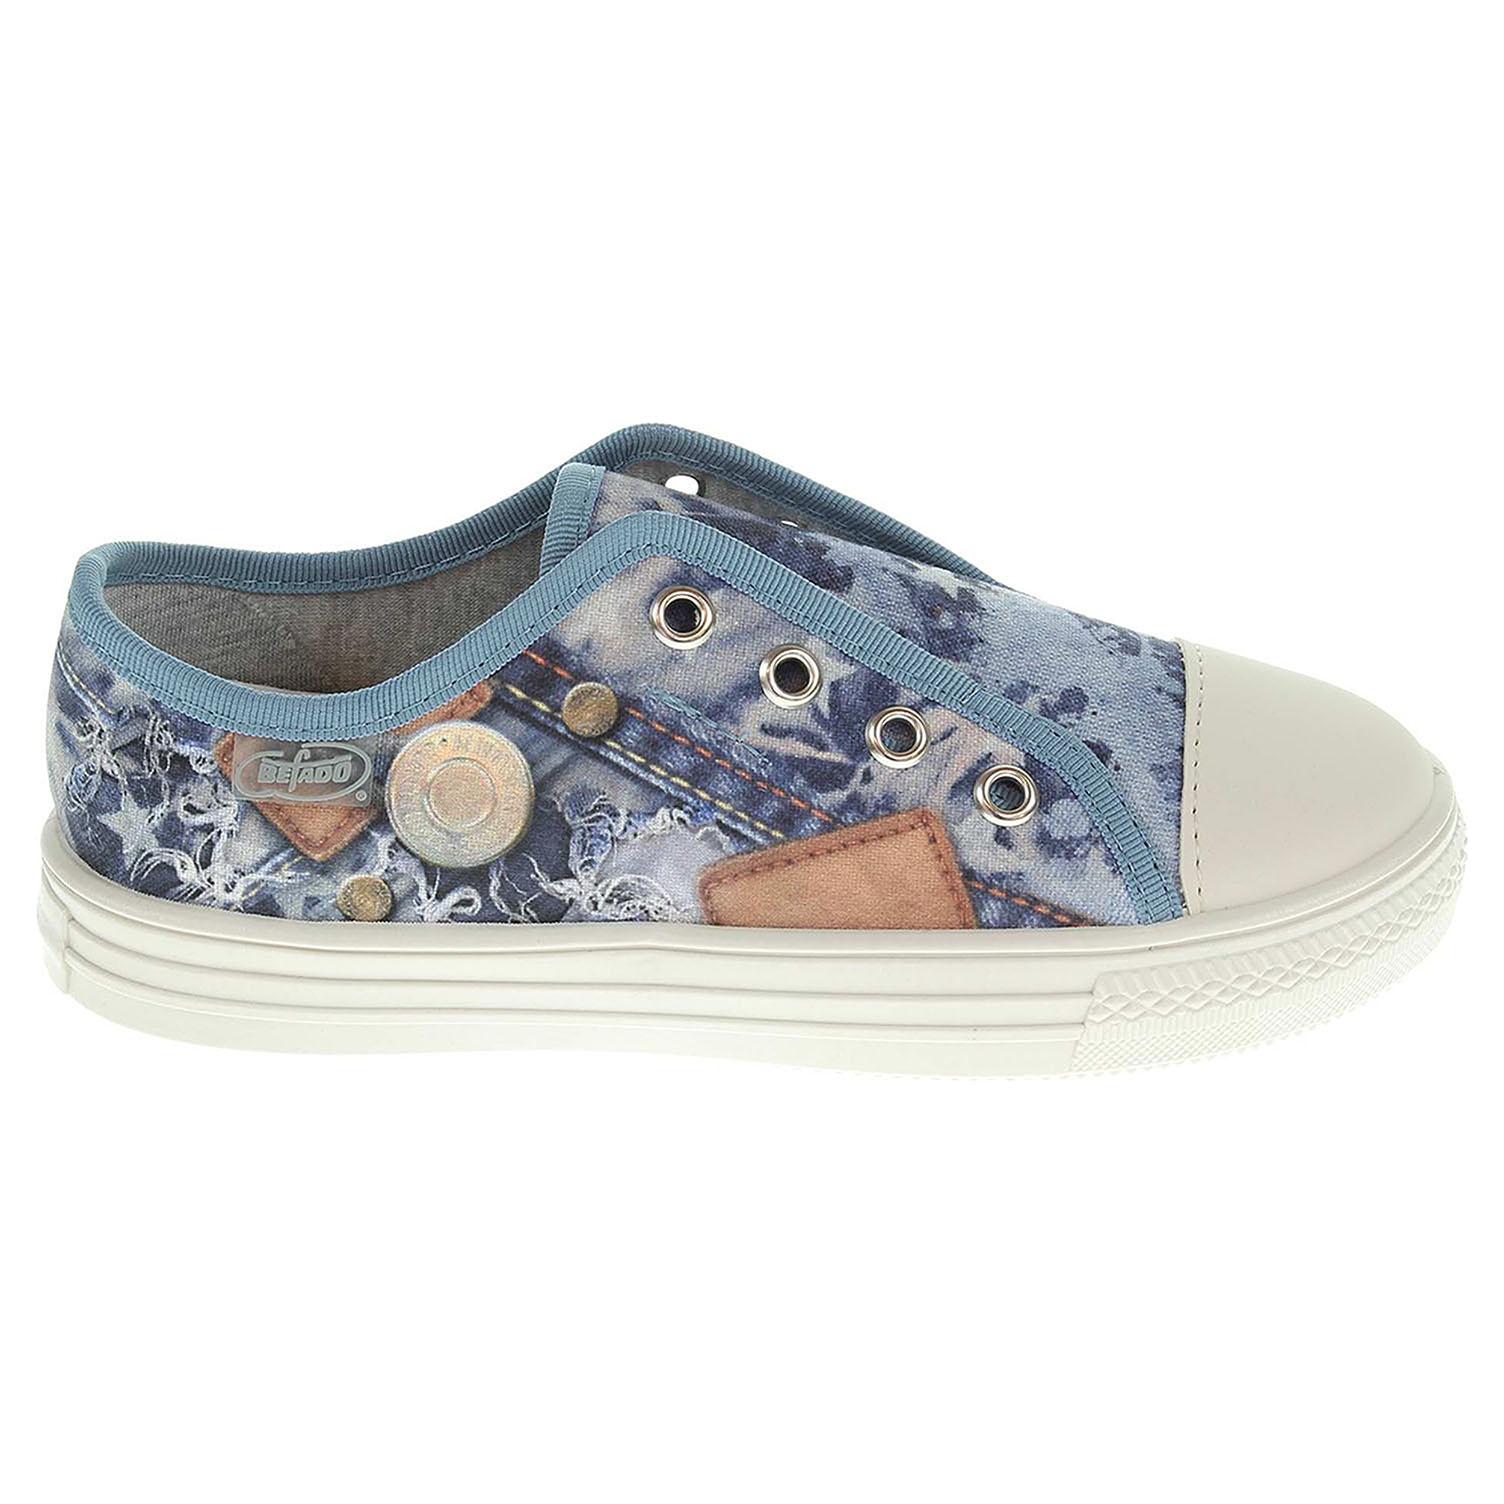 Befado chlapecká obuv 411X014 modrá 411X014 28